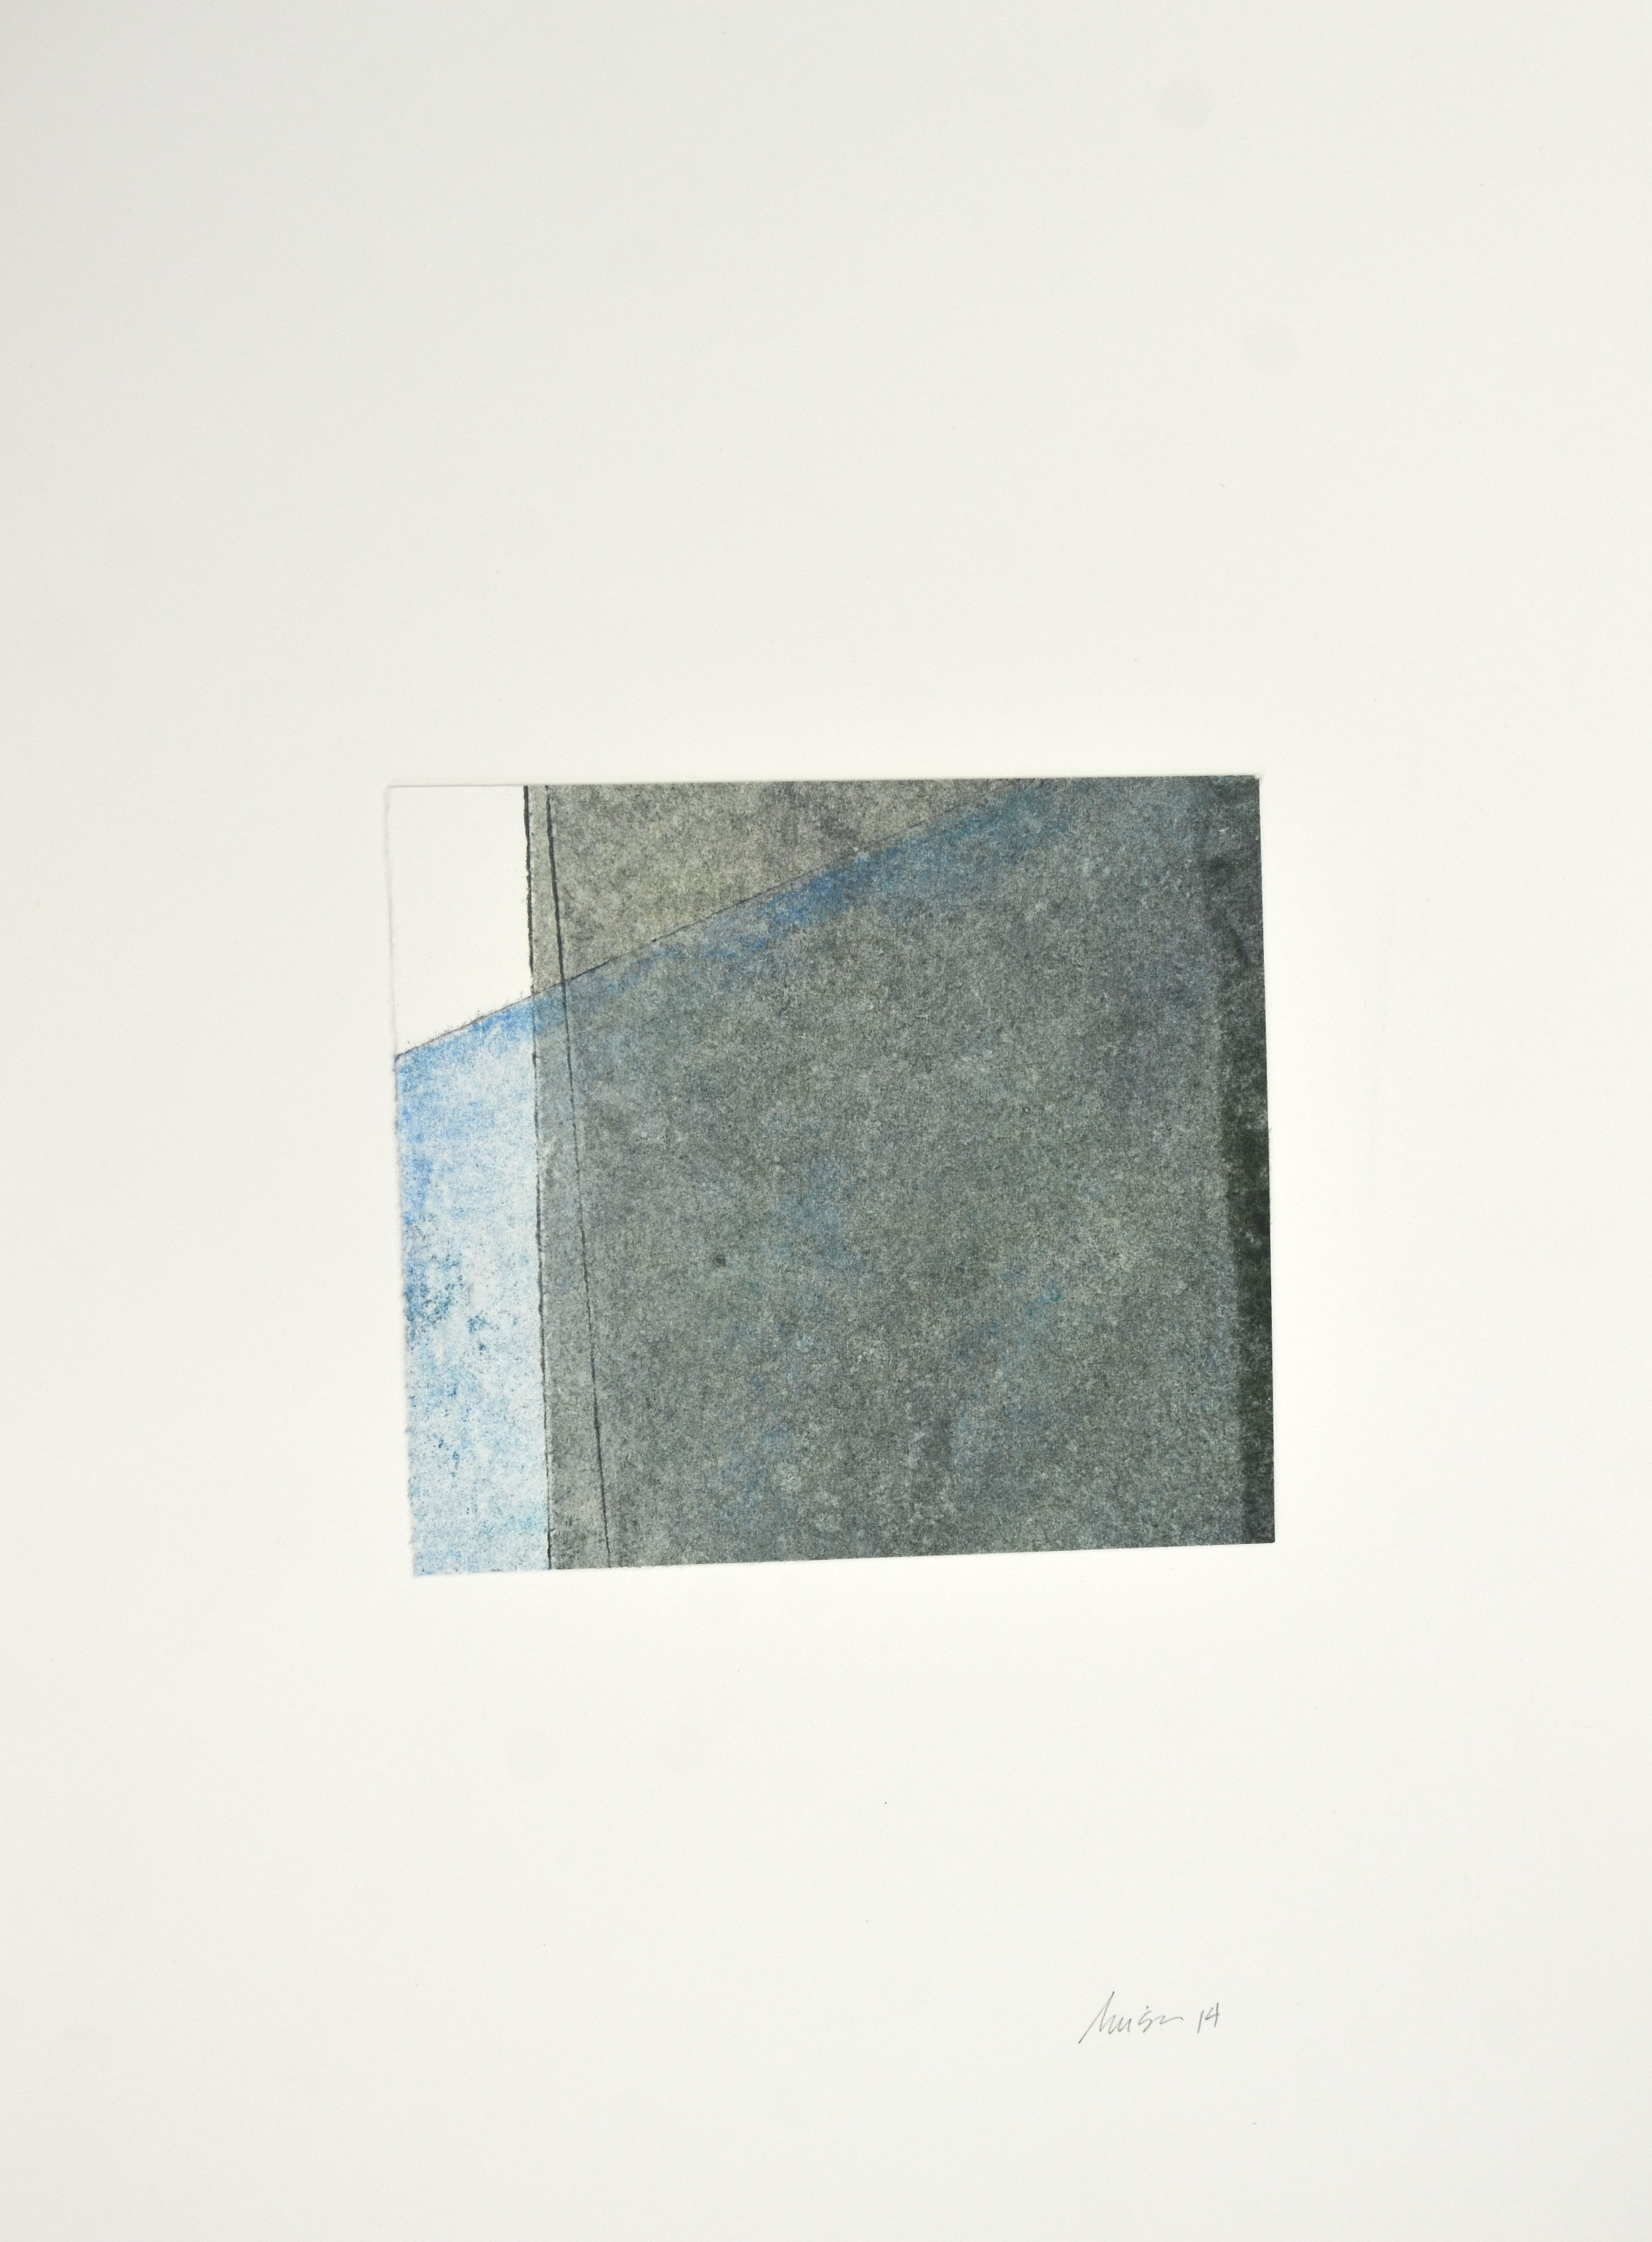 Luisa Duarte. Monotype Collage on Paper. 2014.